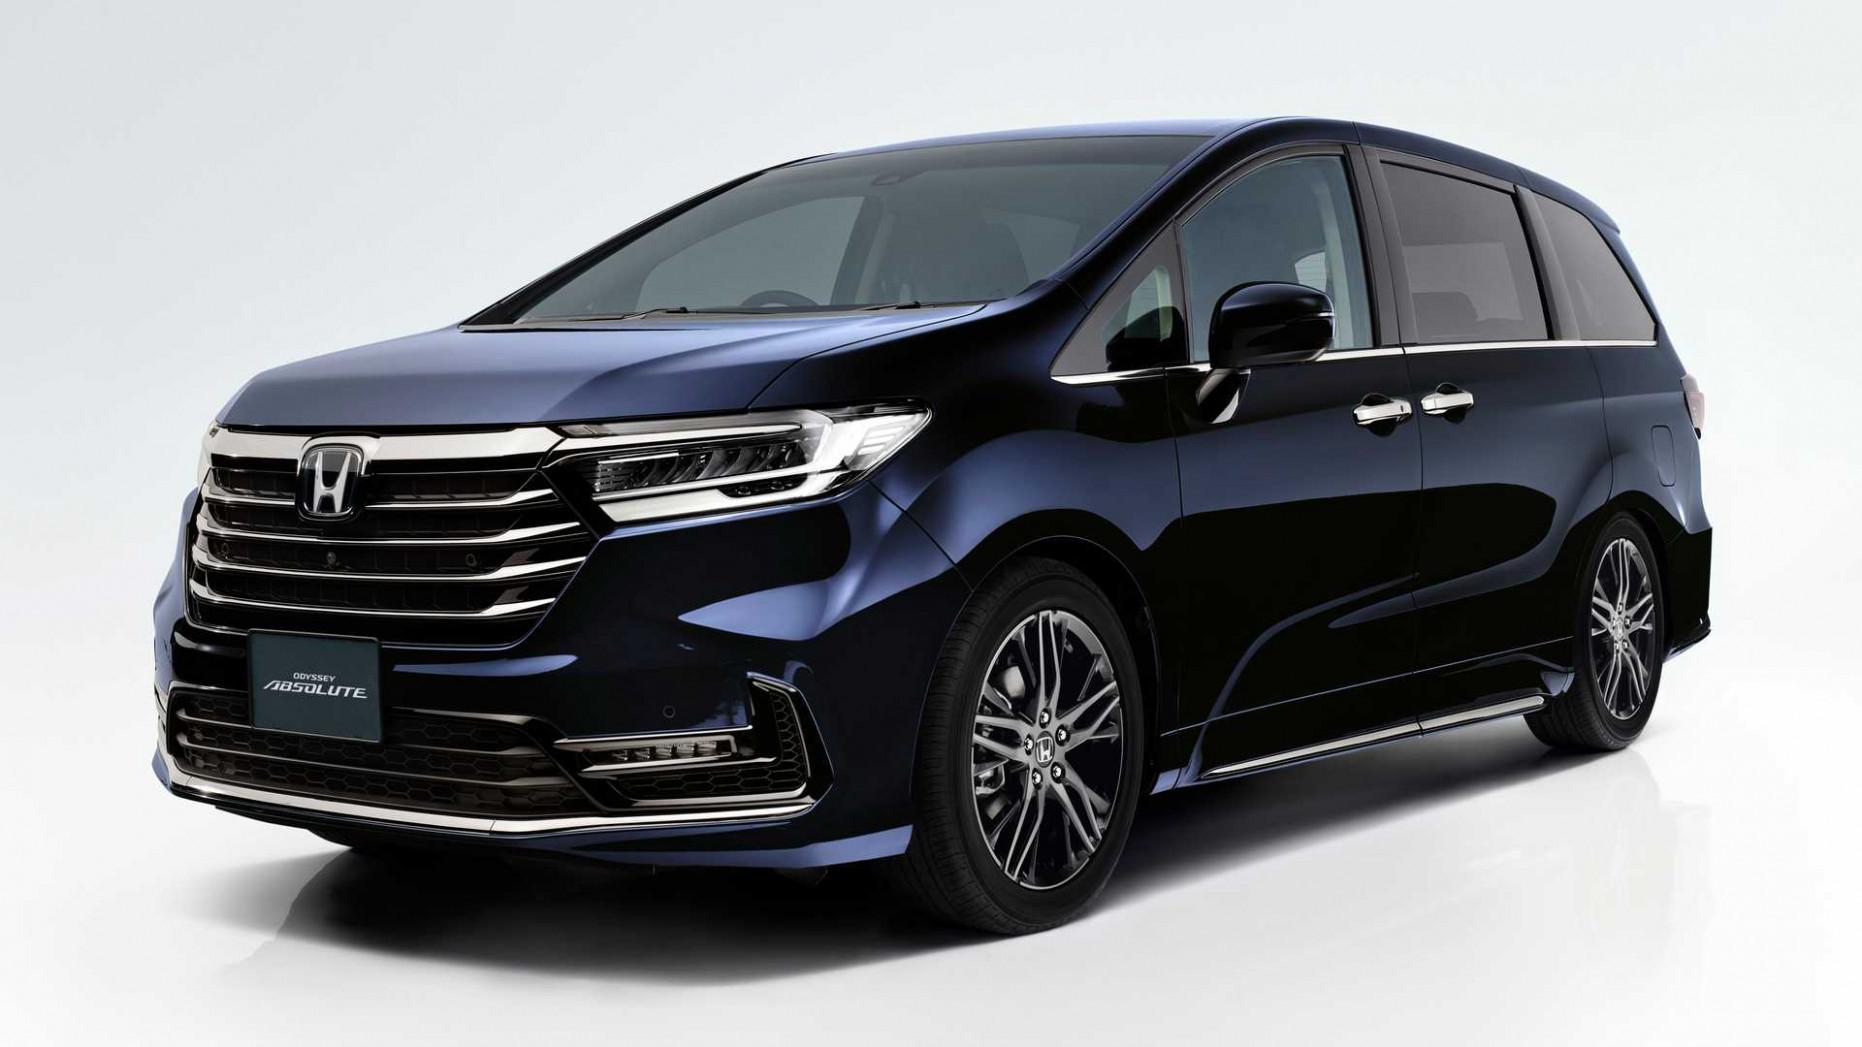 Pricing Honda Odyssey 2022 Japan